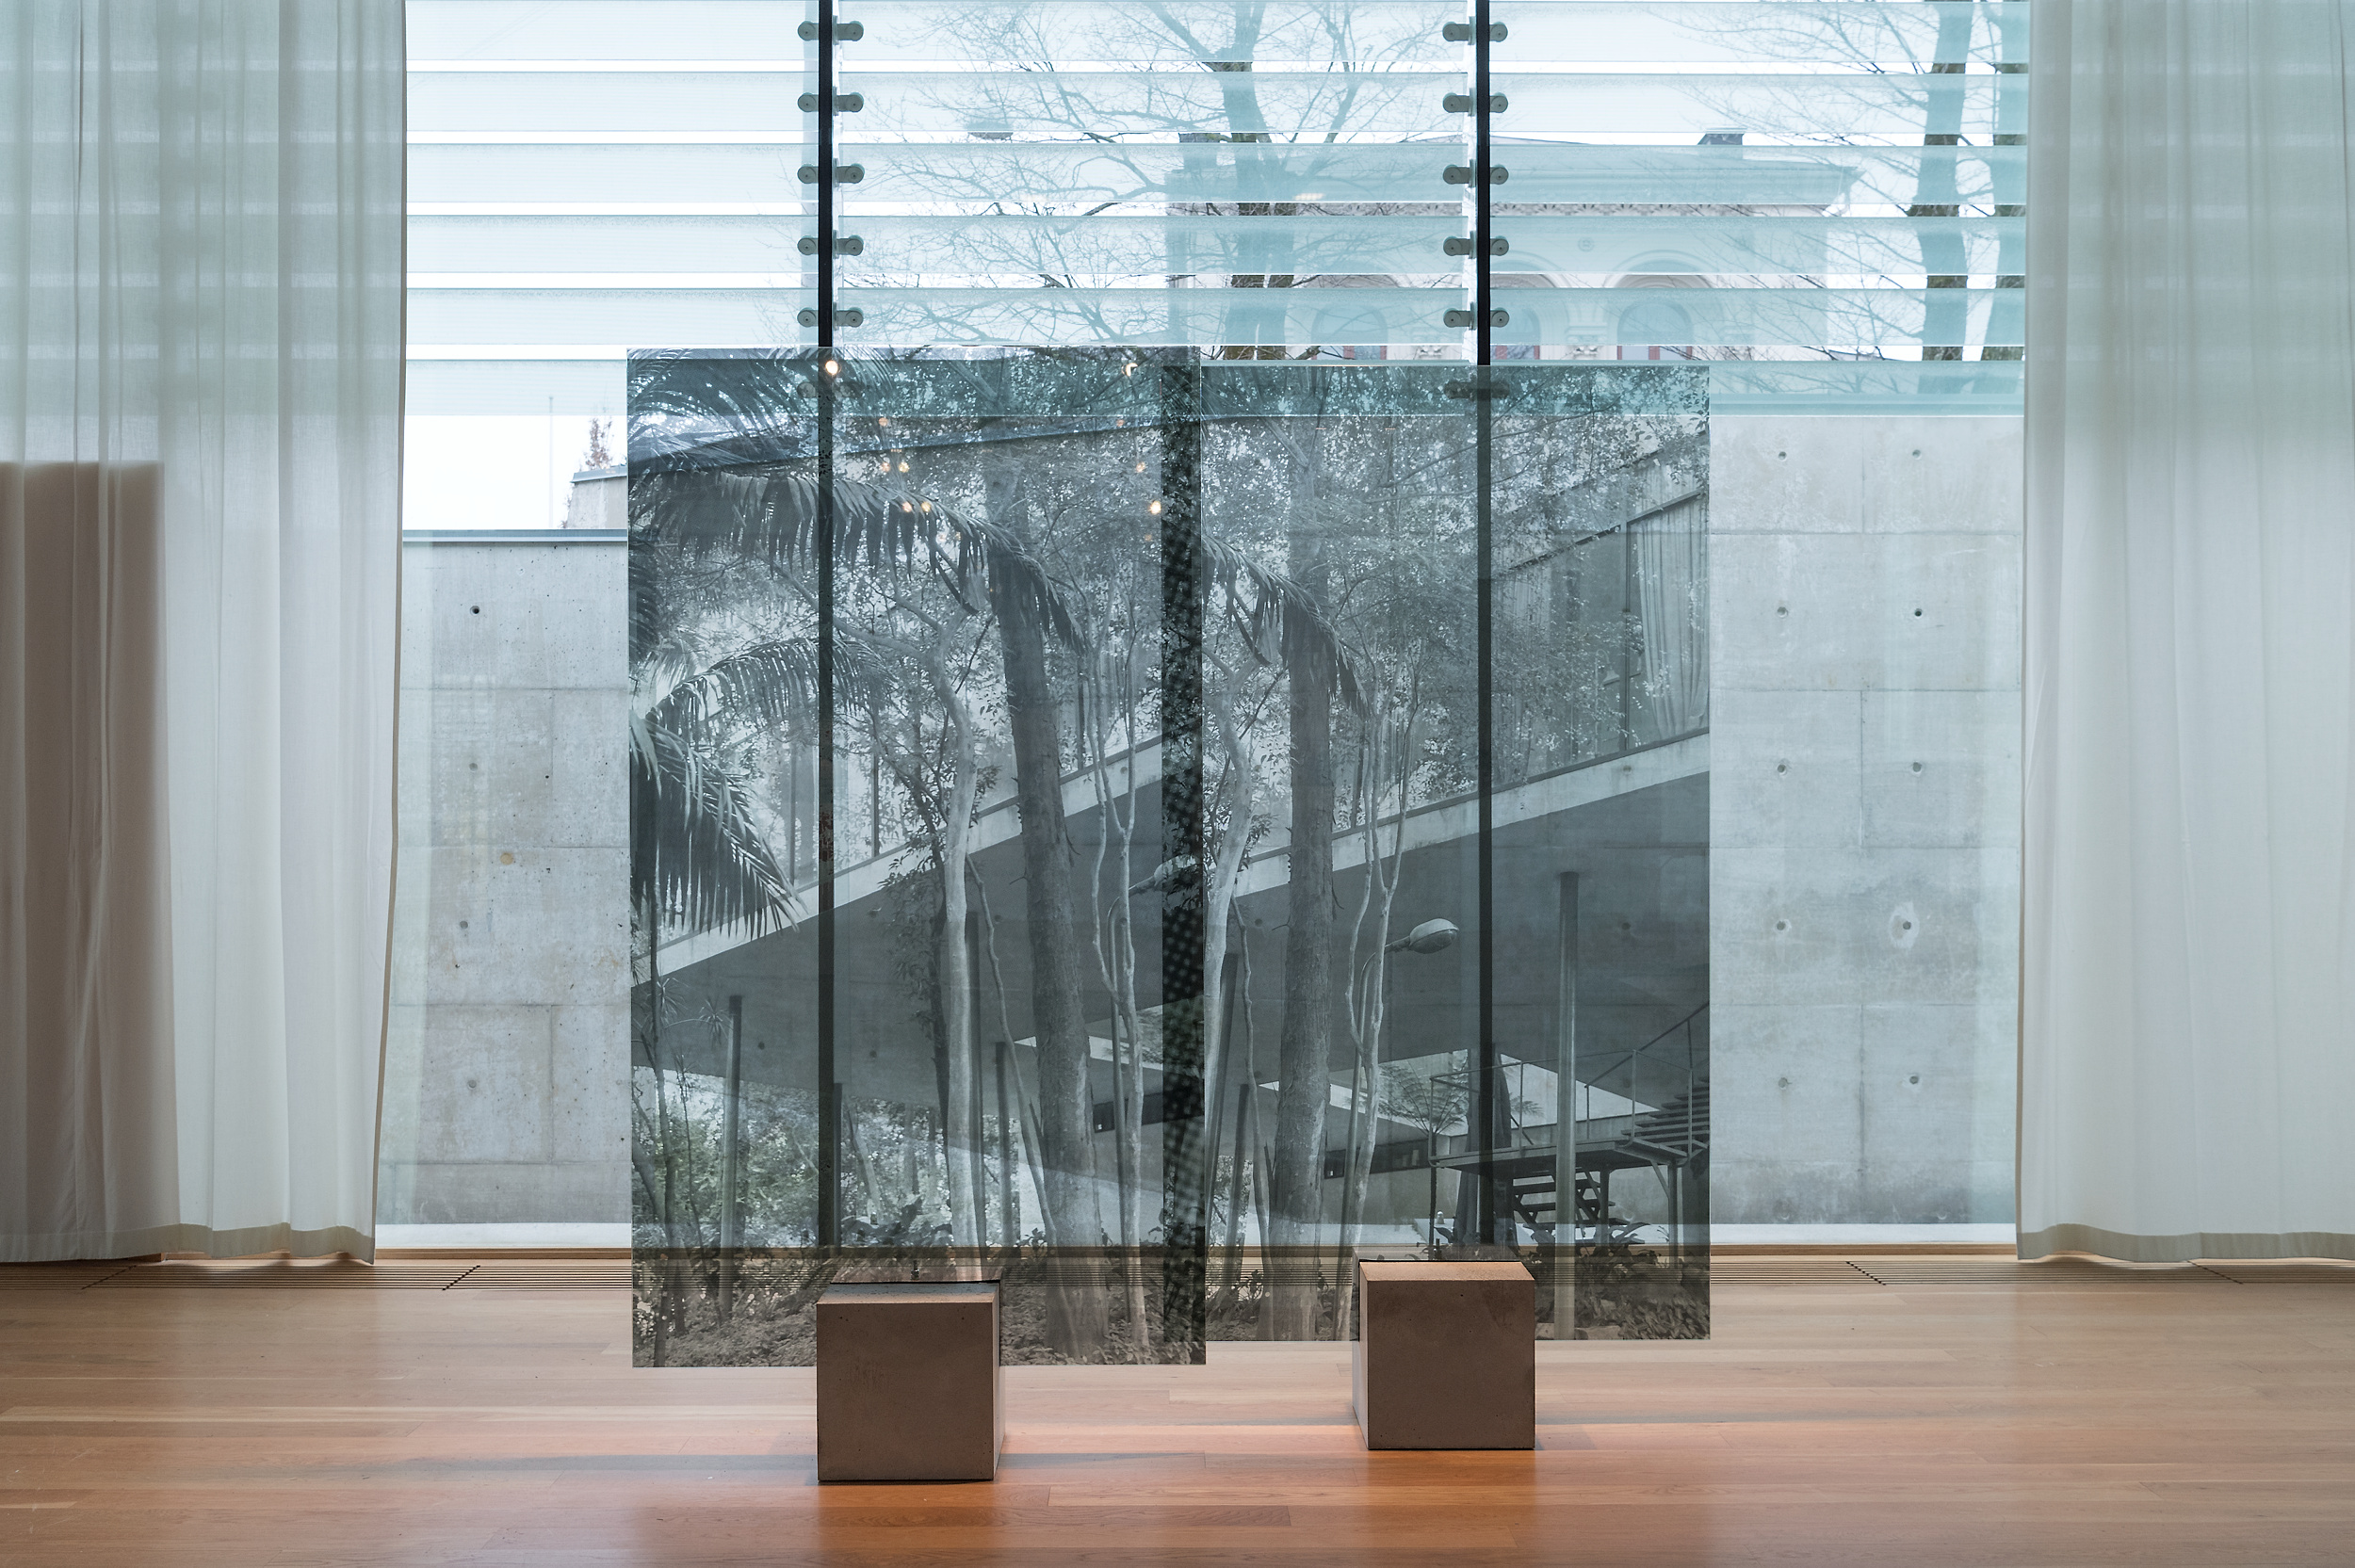 Kota Ezawa, Chez Tortoni , 2015,duratrans transparency and LED lightbox,10 x 13 inches,25.5 x 33 cm, edition of 5, with 2 AP